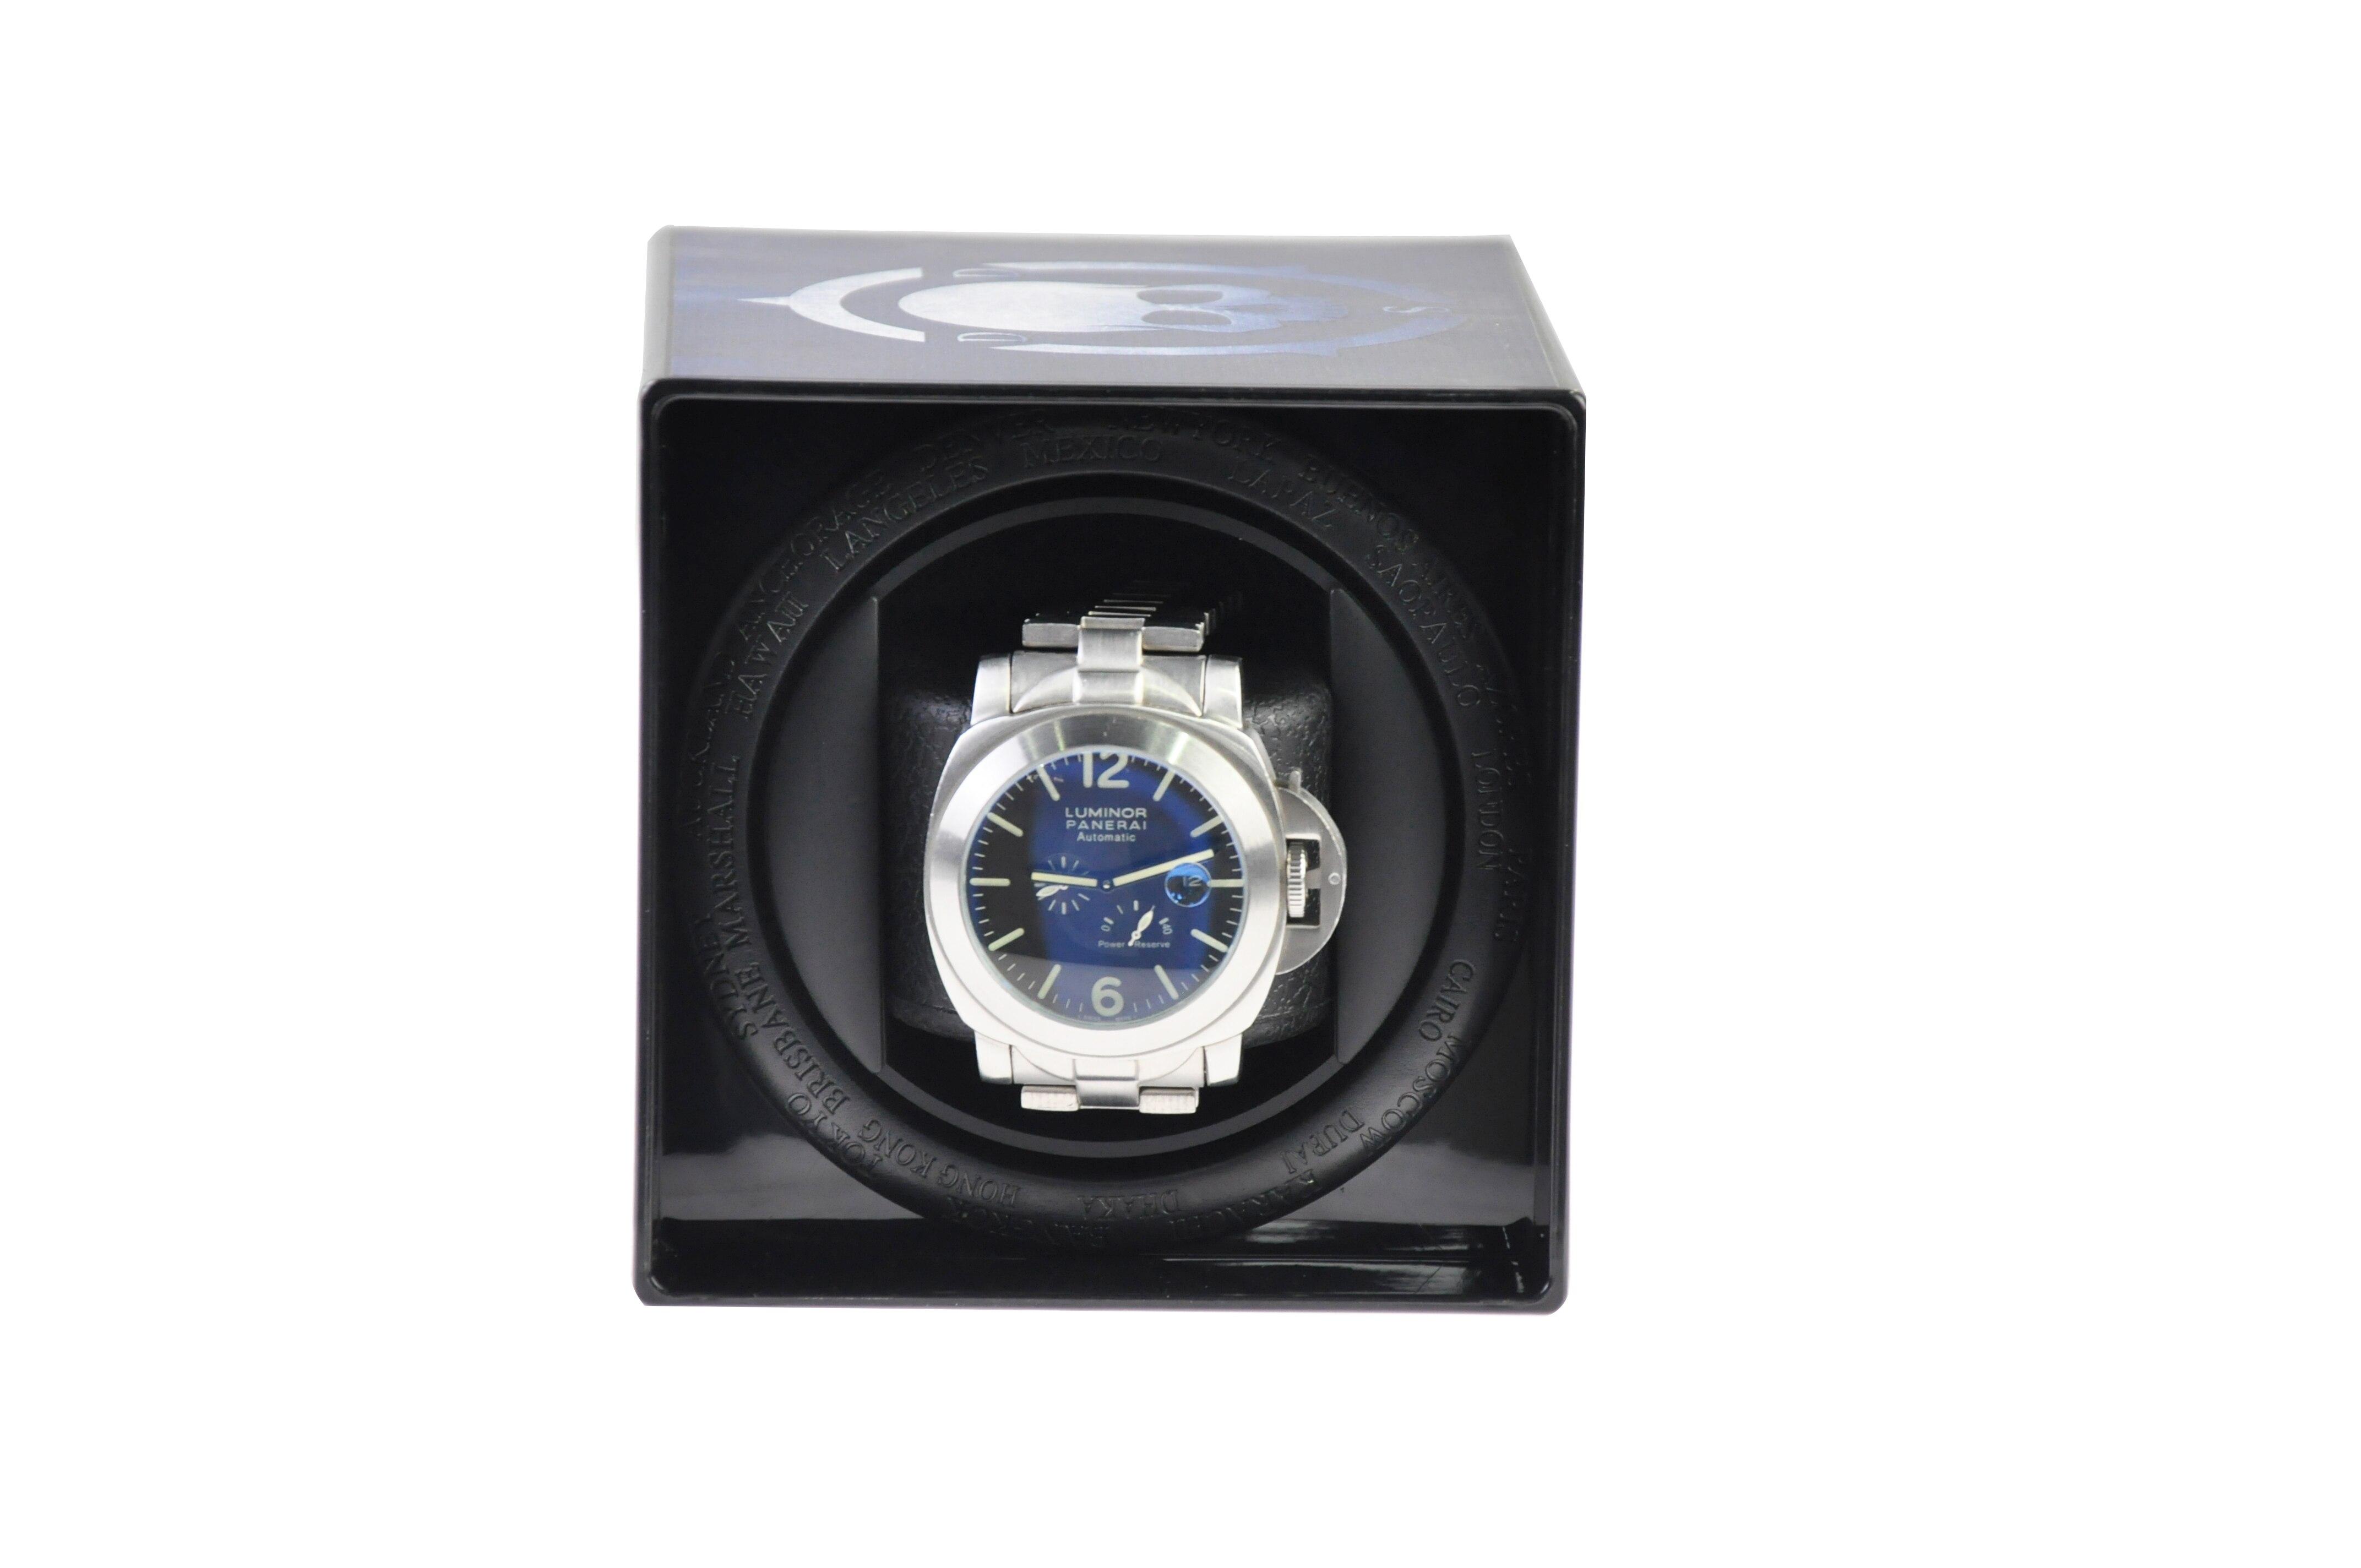 National flag USB Power Supply Mechanical Watch Winding Box Case Motor Shaker Mini Watch Winder Holder Display Jewelry Storage enlarge